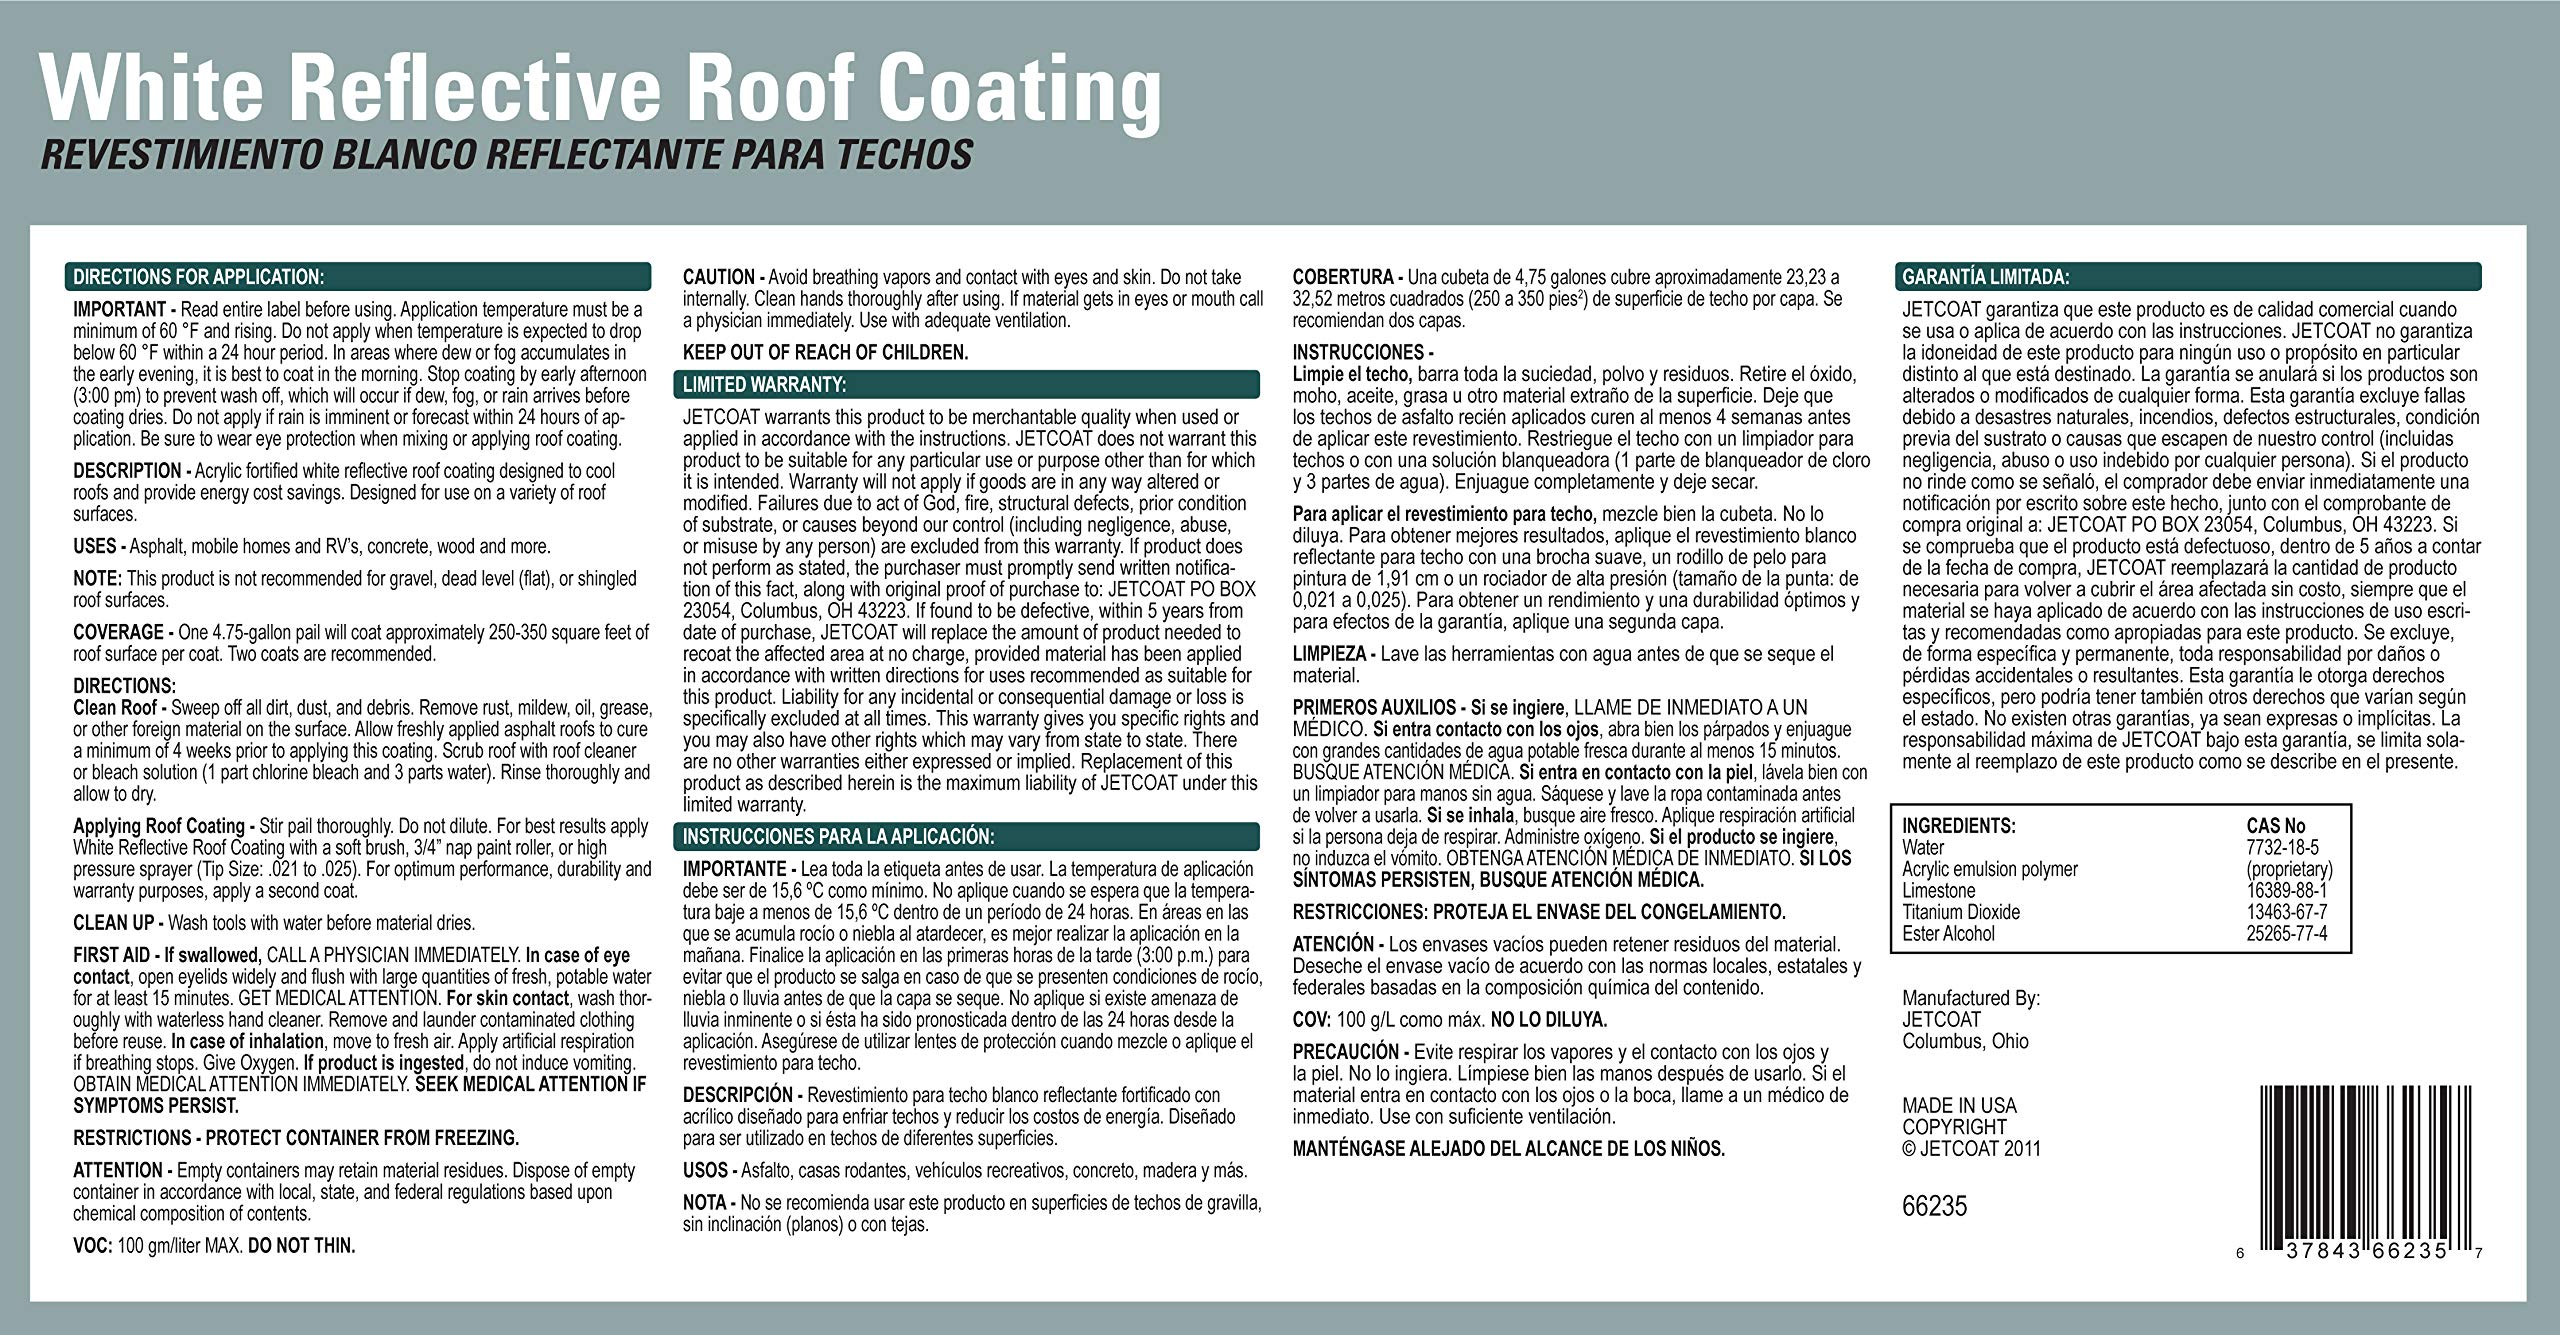 Jetcoat Cool King Elastomeric Acrylic Reflective Roof Coating, White, 5 Gallon, 5 Year Protection by Jetcoat (Image #5)